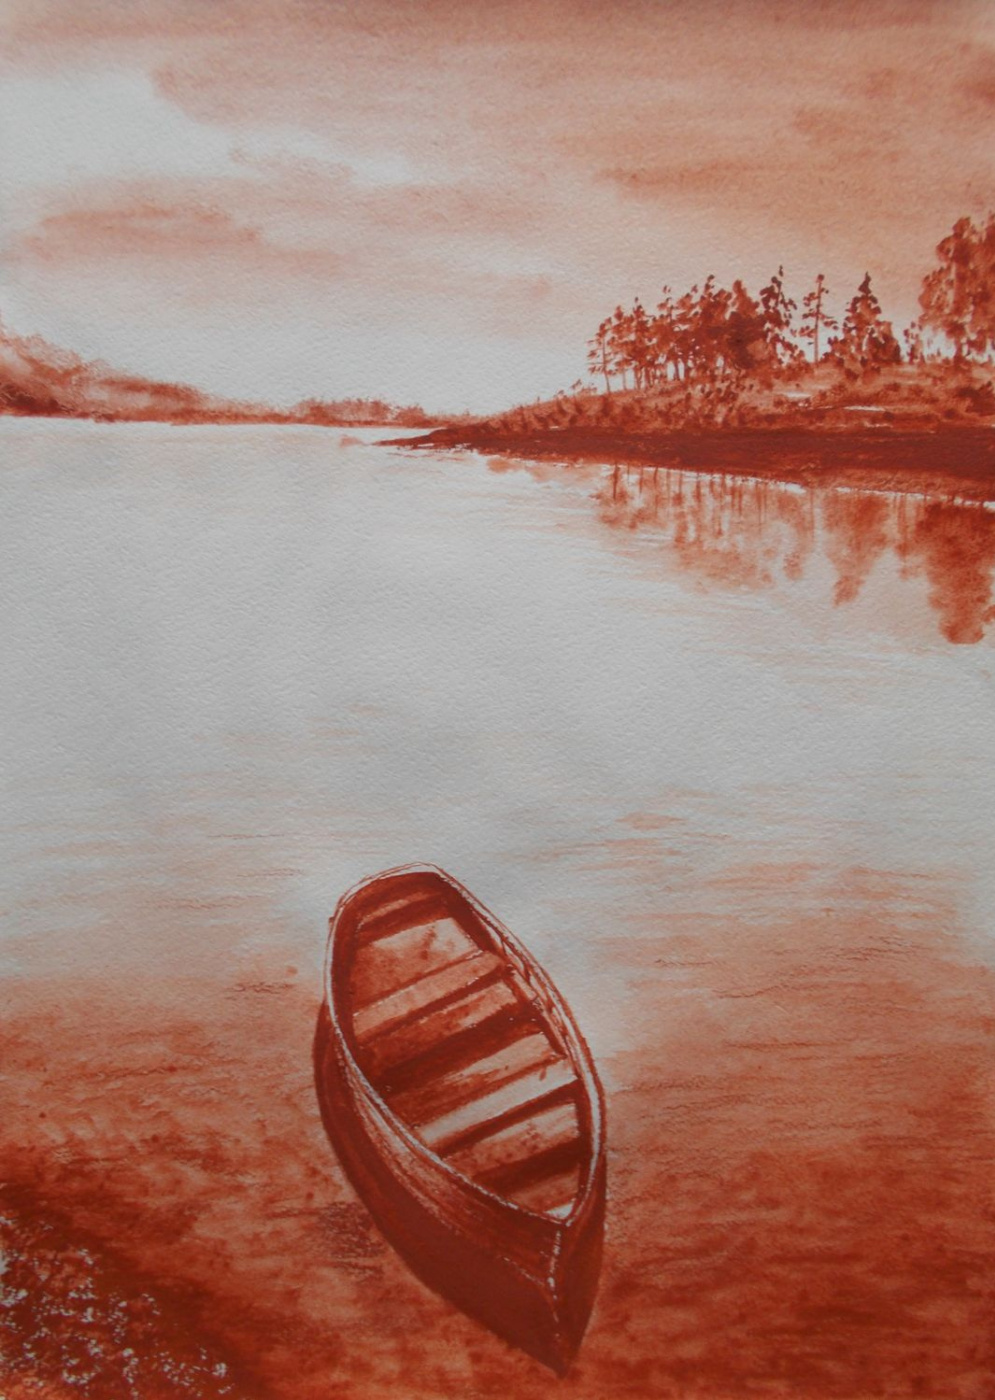 Vladimir Vasilyevich Abaimov. Landscape with a Boat 2